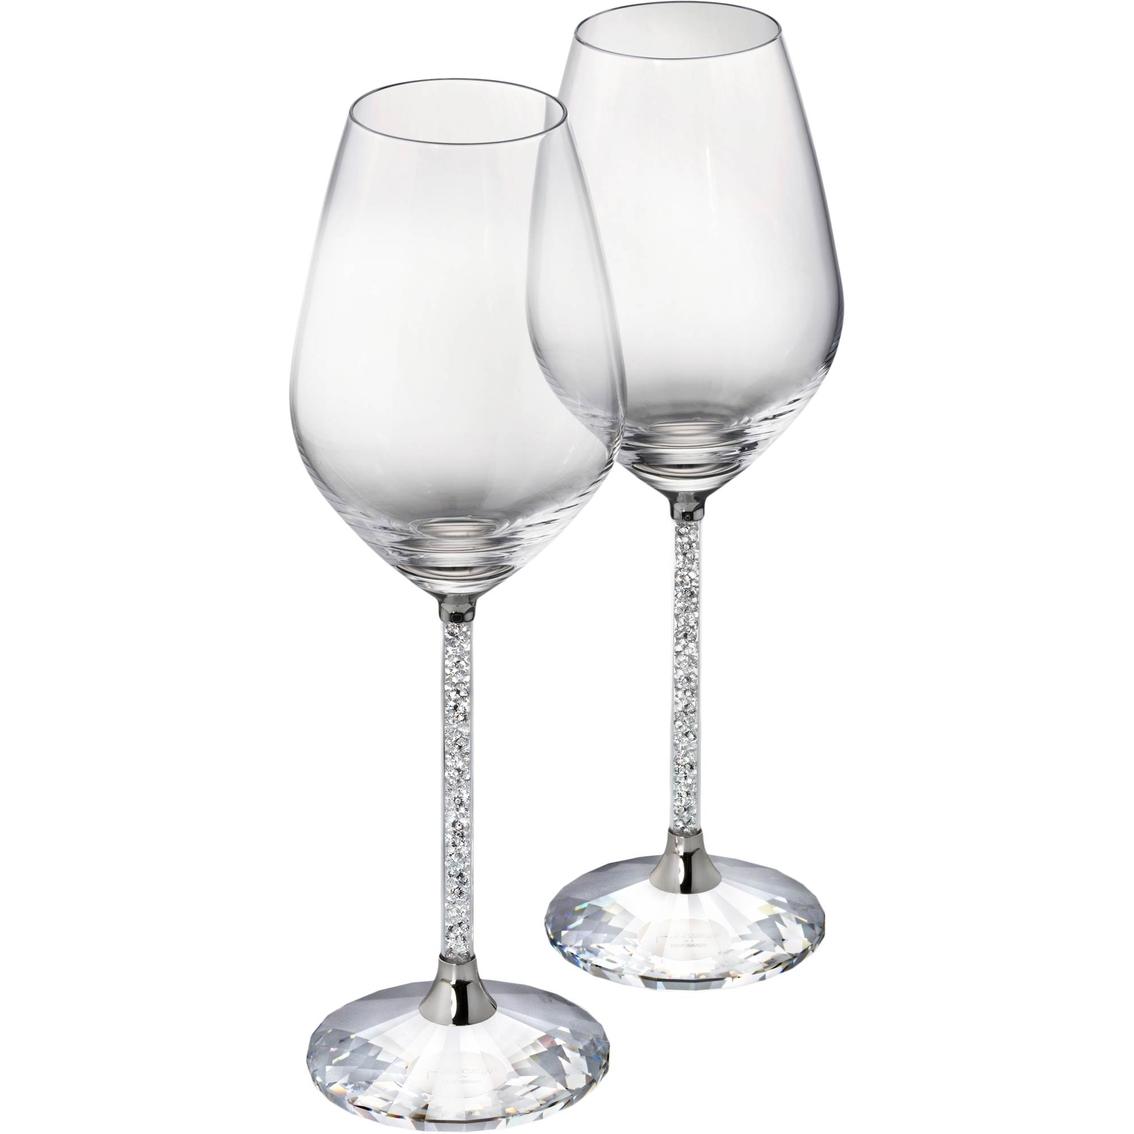 c5a59d8ac607 Swarovski 2 Pc. Crystalline Red Wine Glass Set